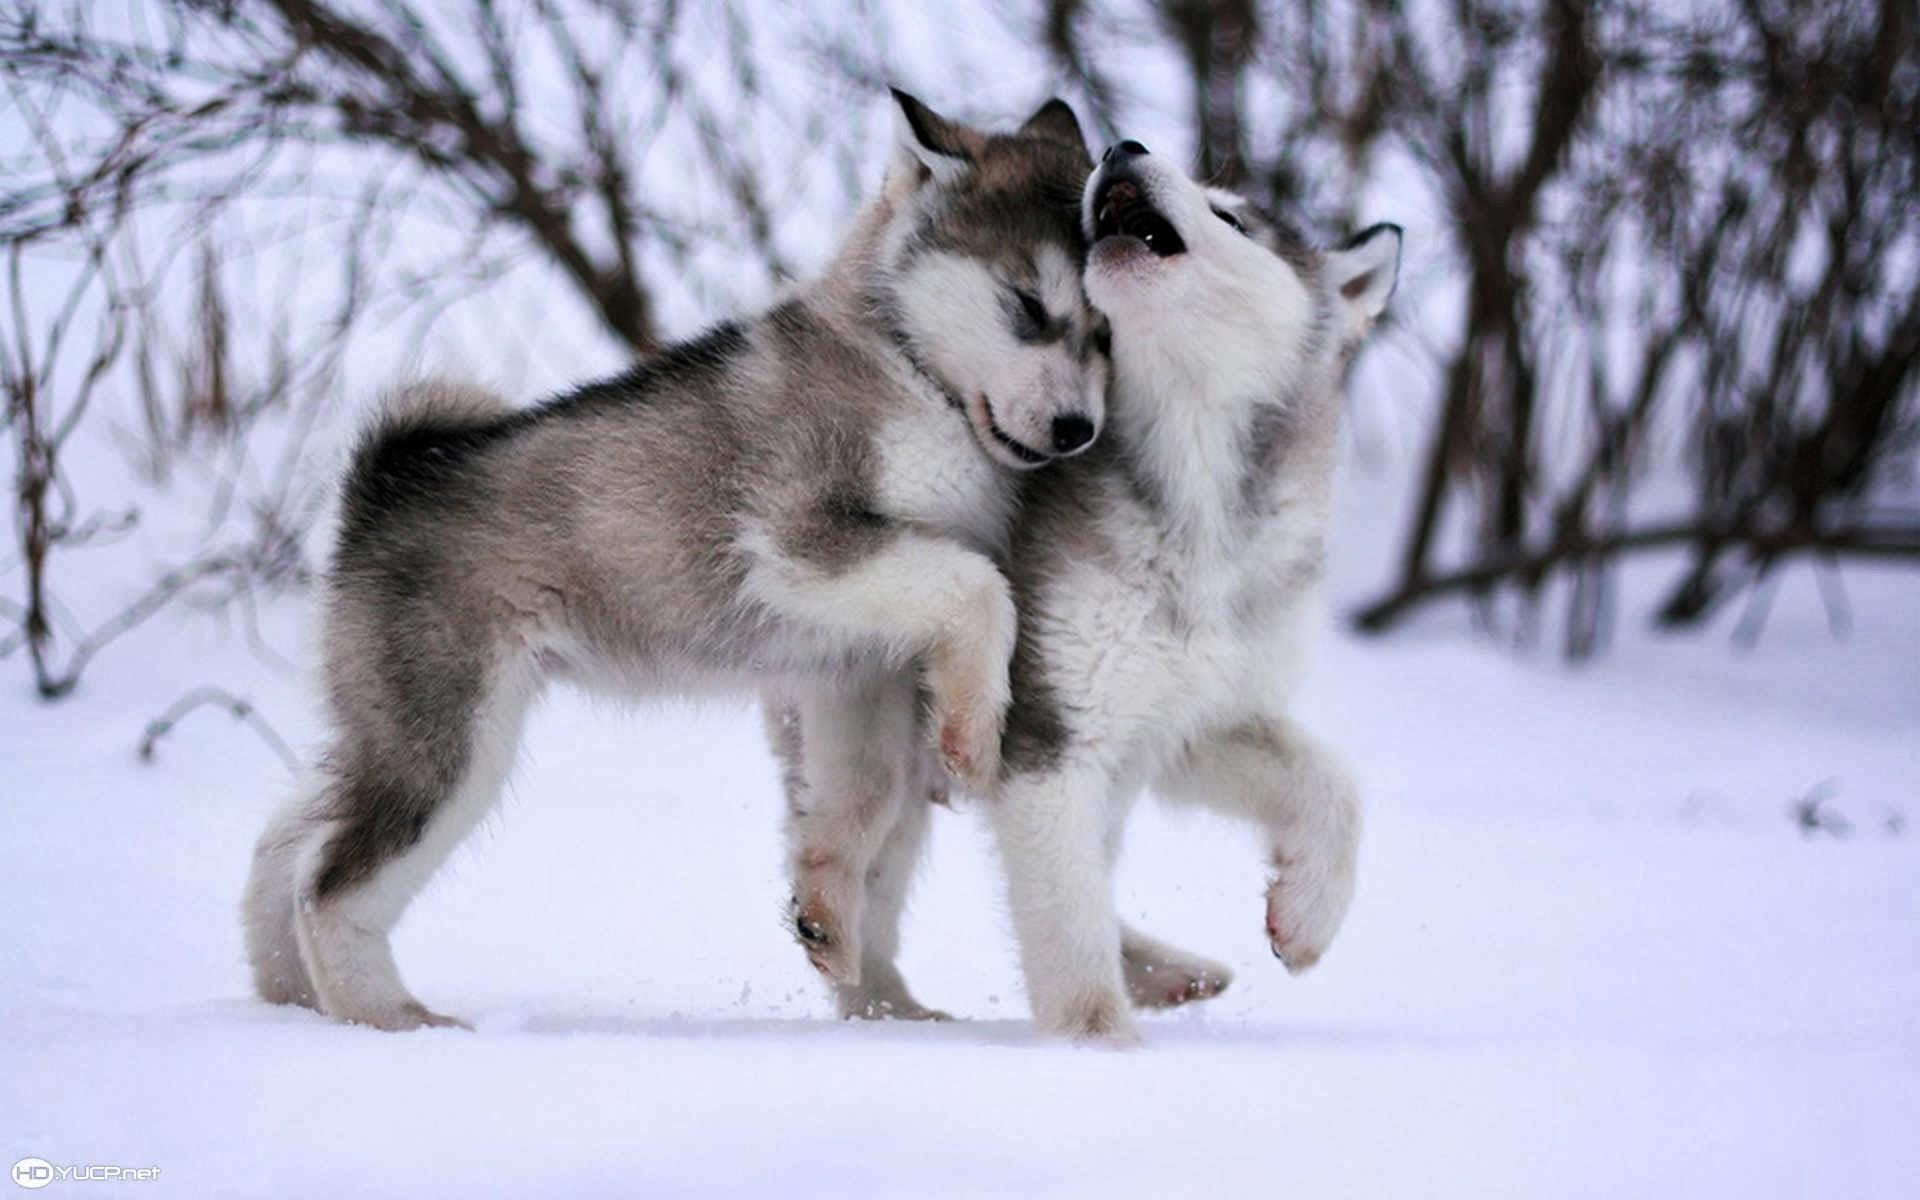 Alaskan Malamute Puppies Dogs Cute HD Wallpaper For Desktop